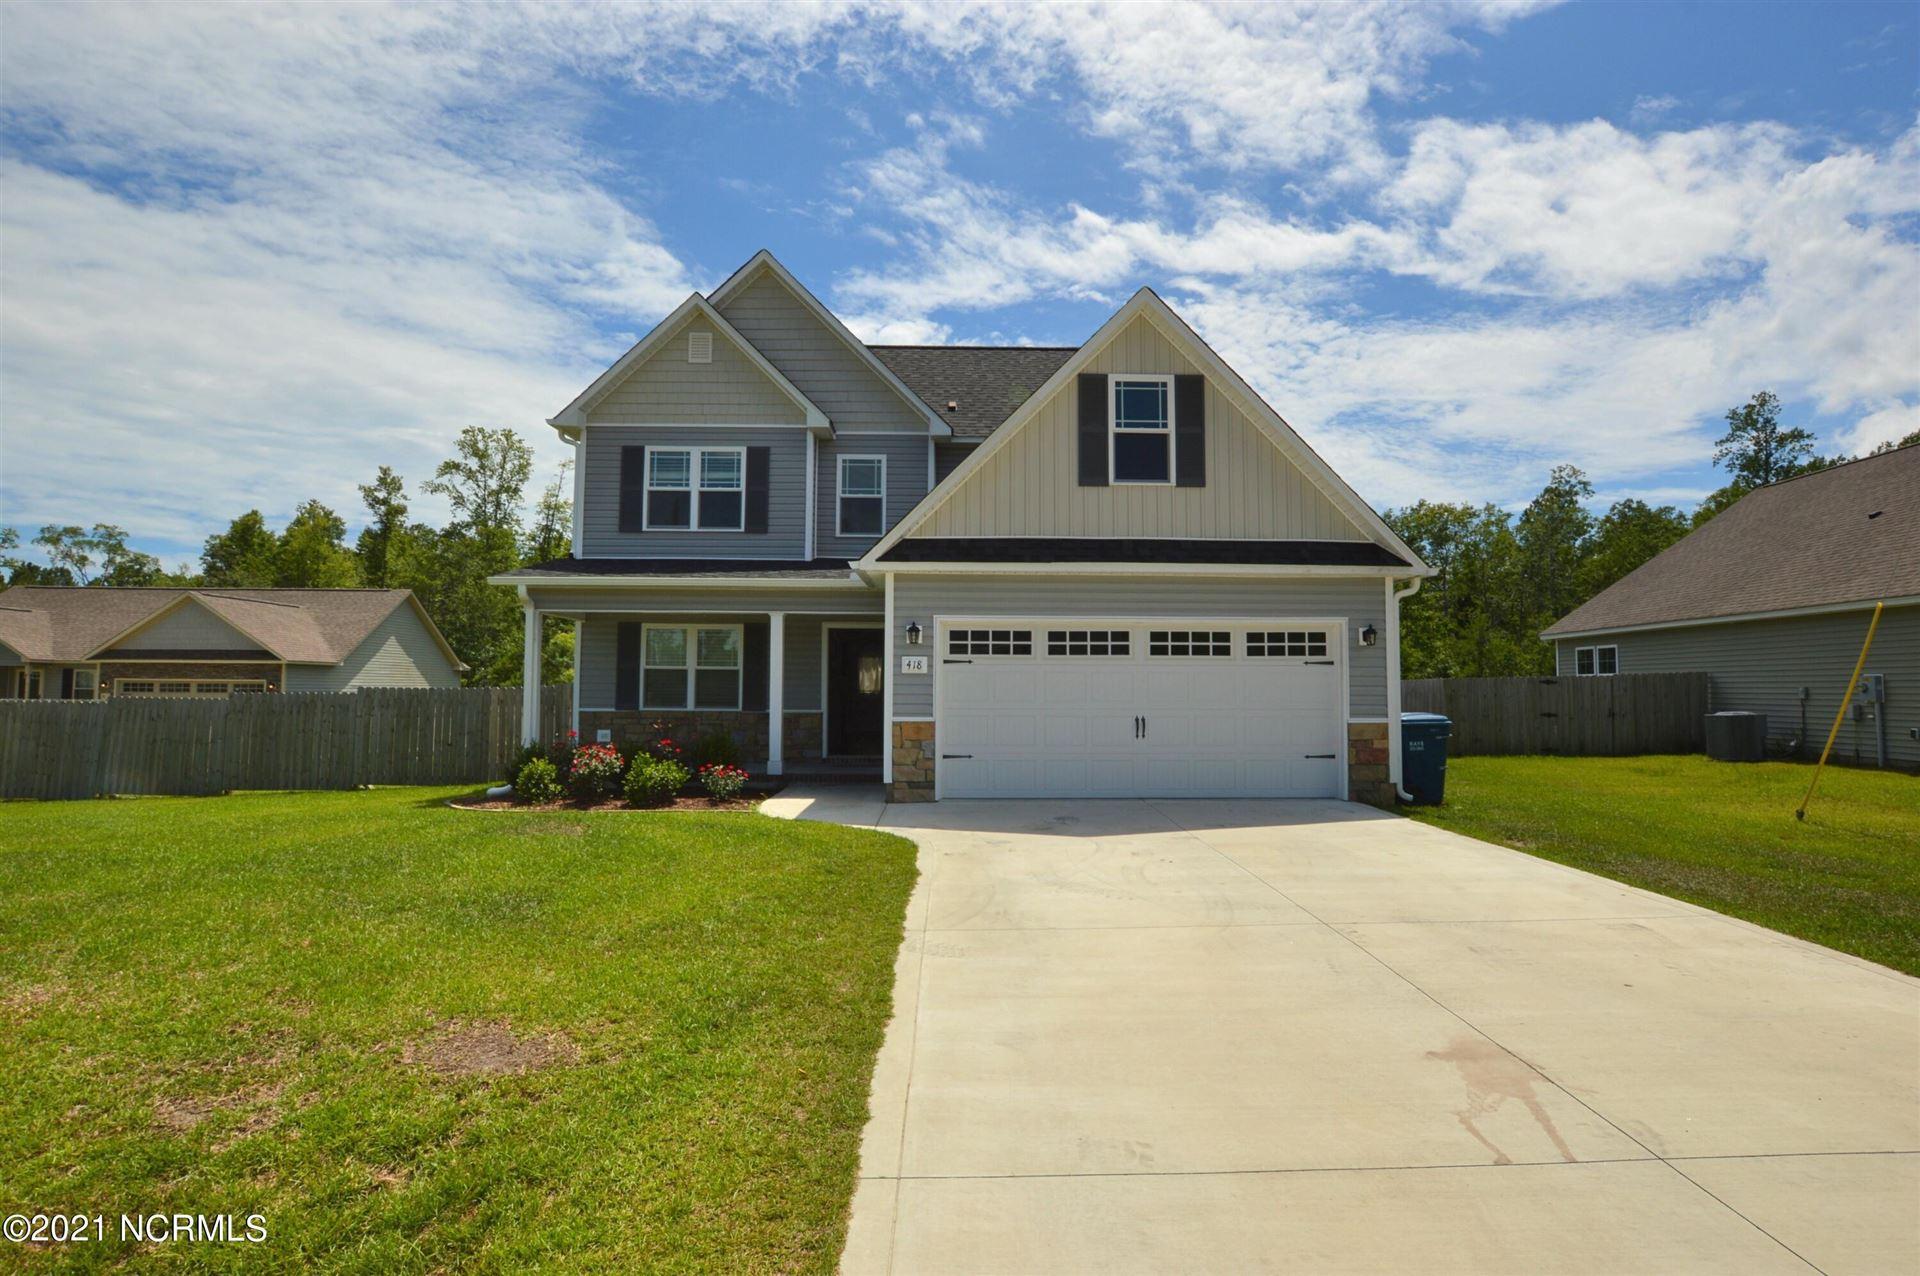 Photo of 418 Mccall Drive, Jacksonville, NC 28540 (MLS # 100285636)